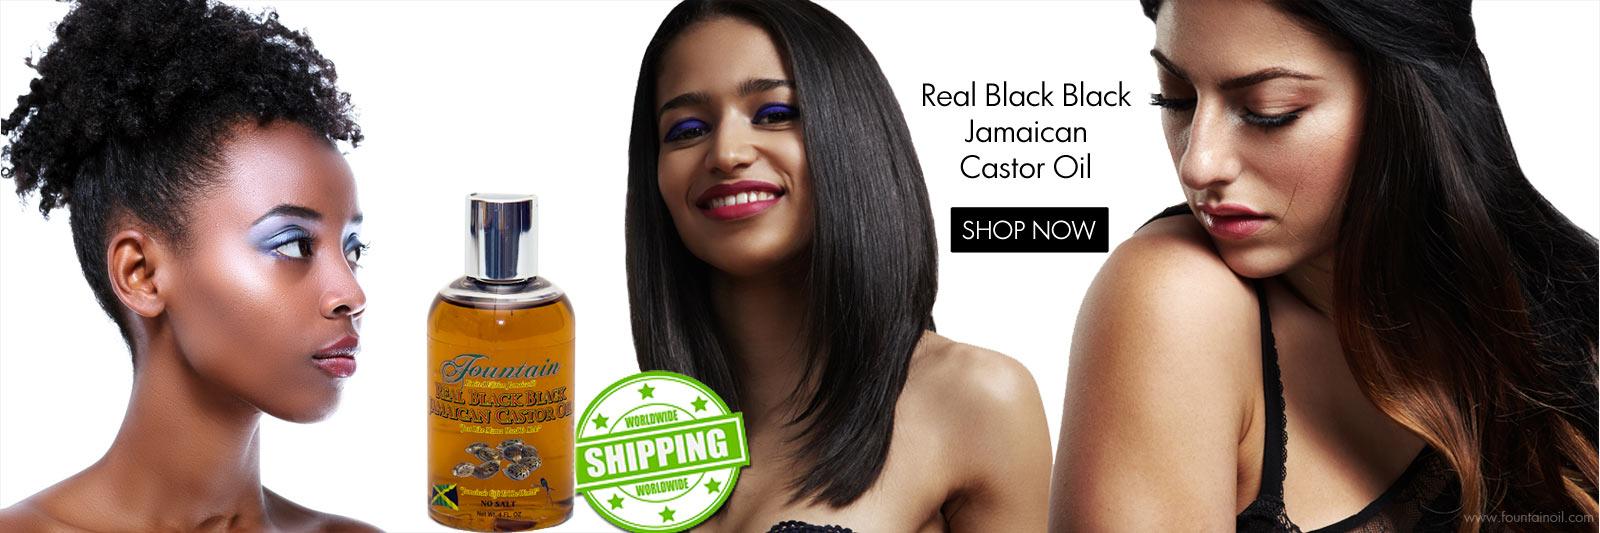 Real Black Black Castor Oil